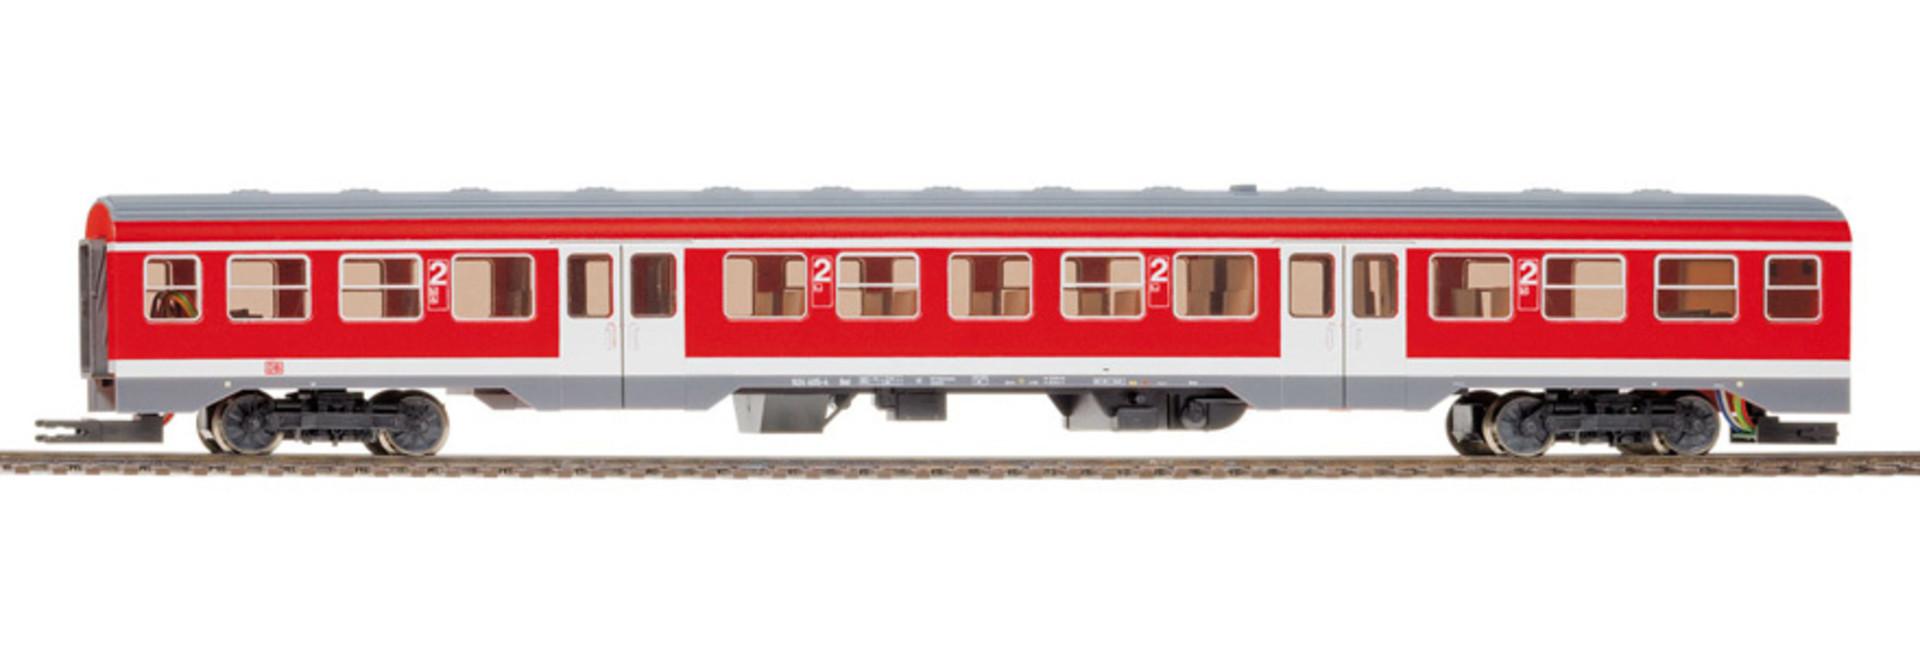 1523840 DB AG 934 441 Mittelwagen verkehrsrot, 3L-WS